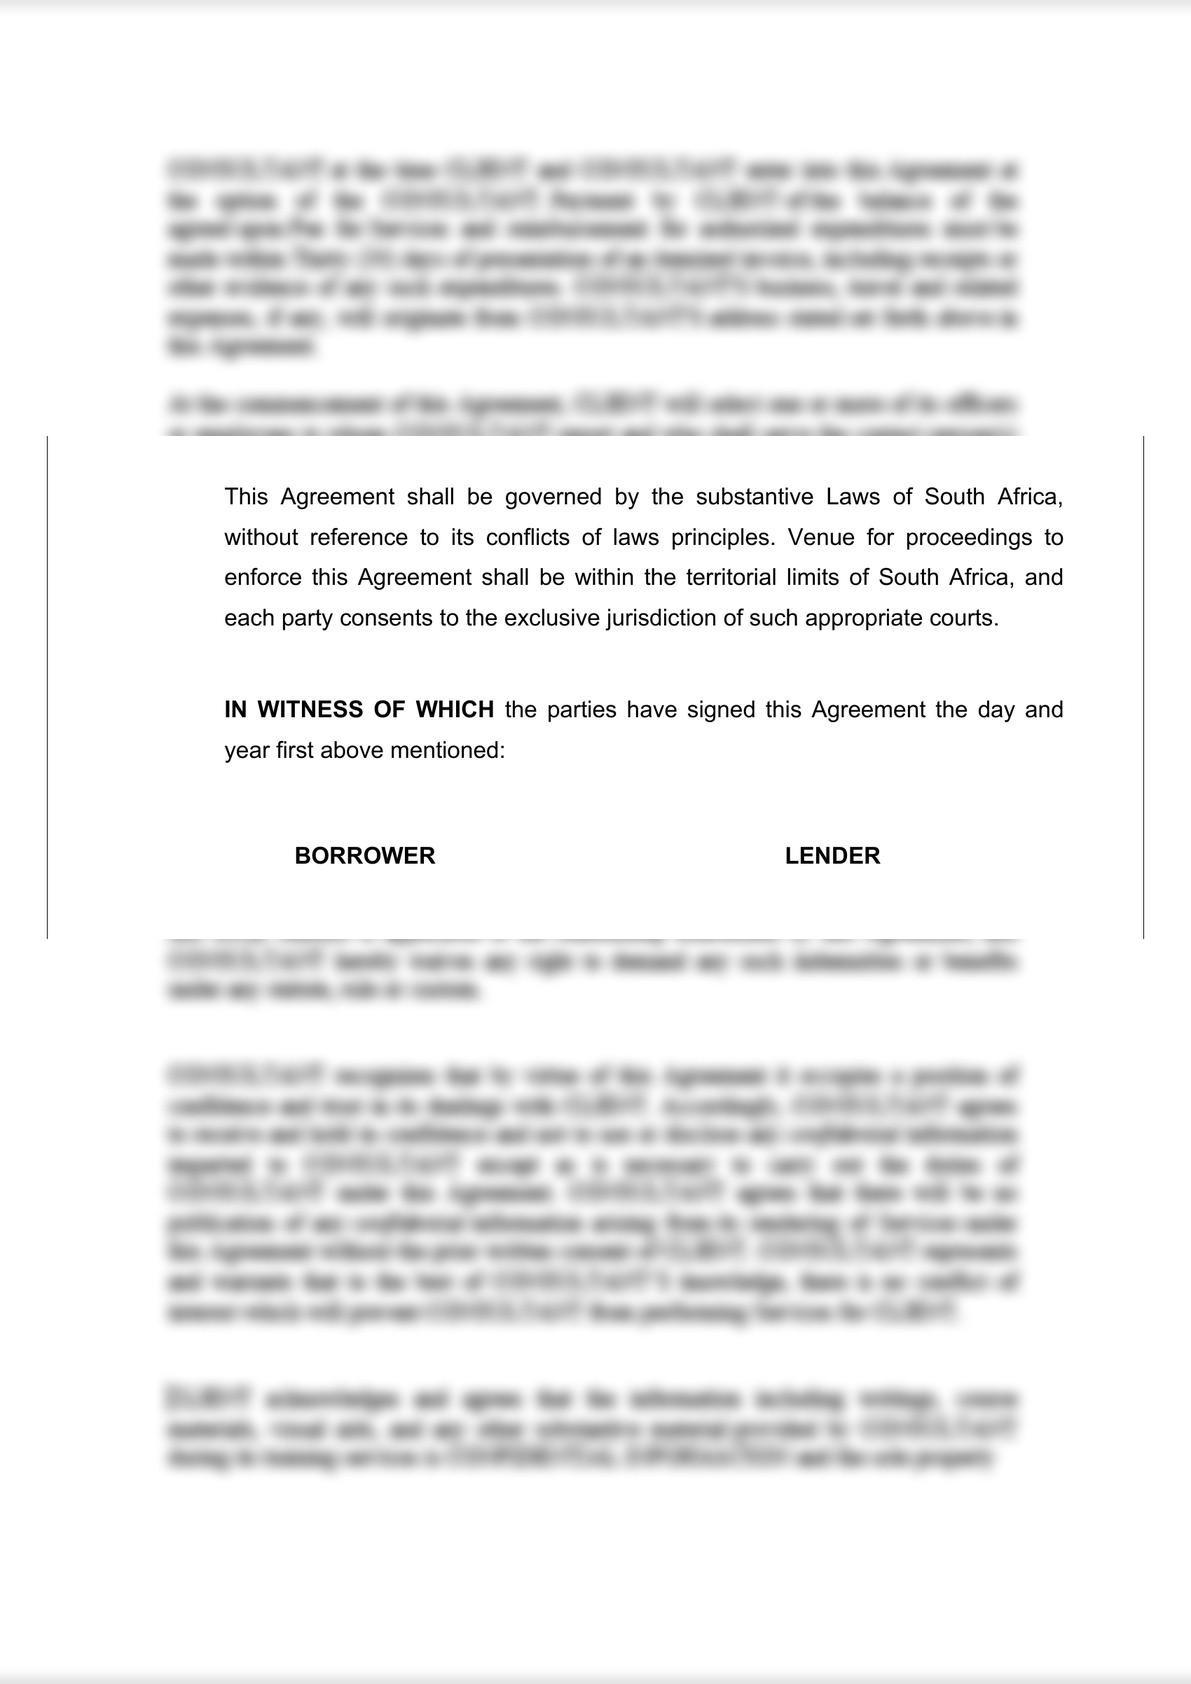 Loan Agreement (Secured)-7